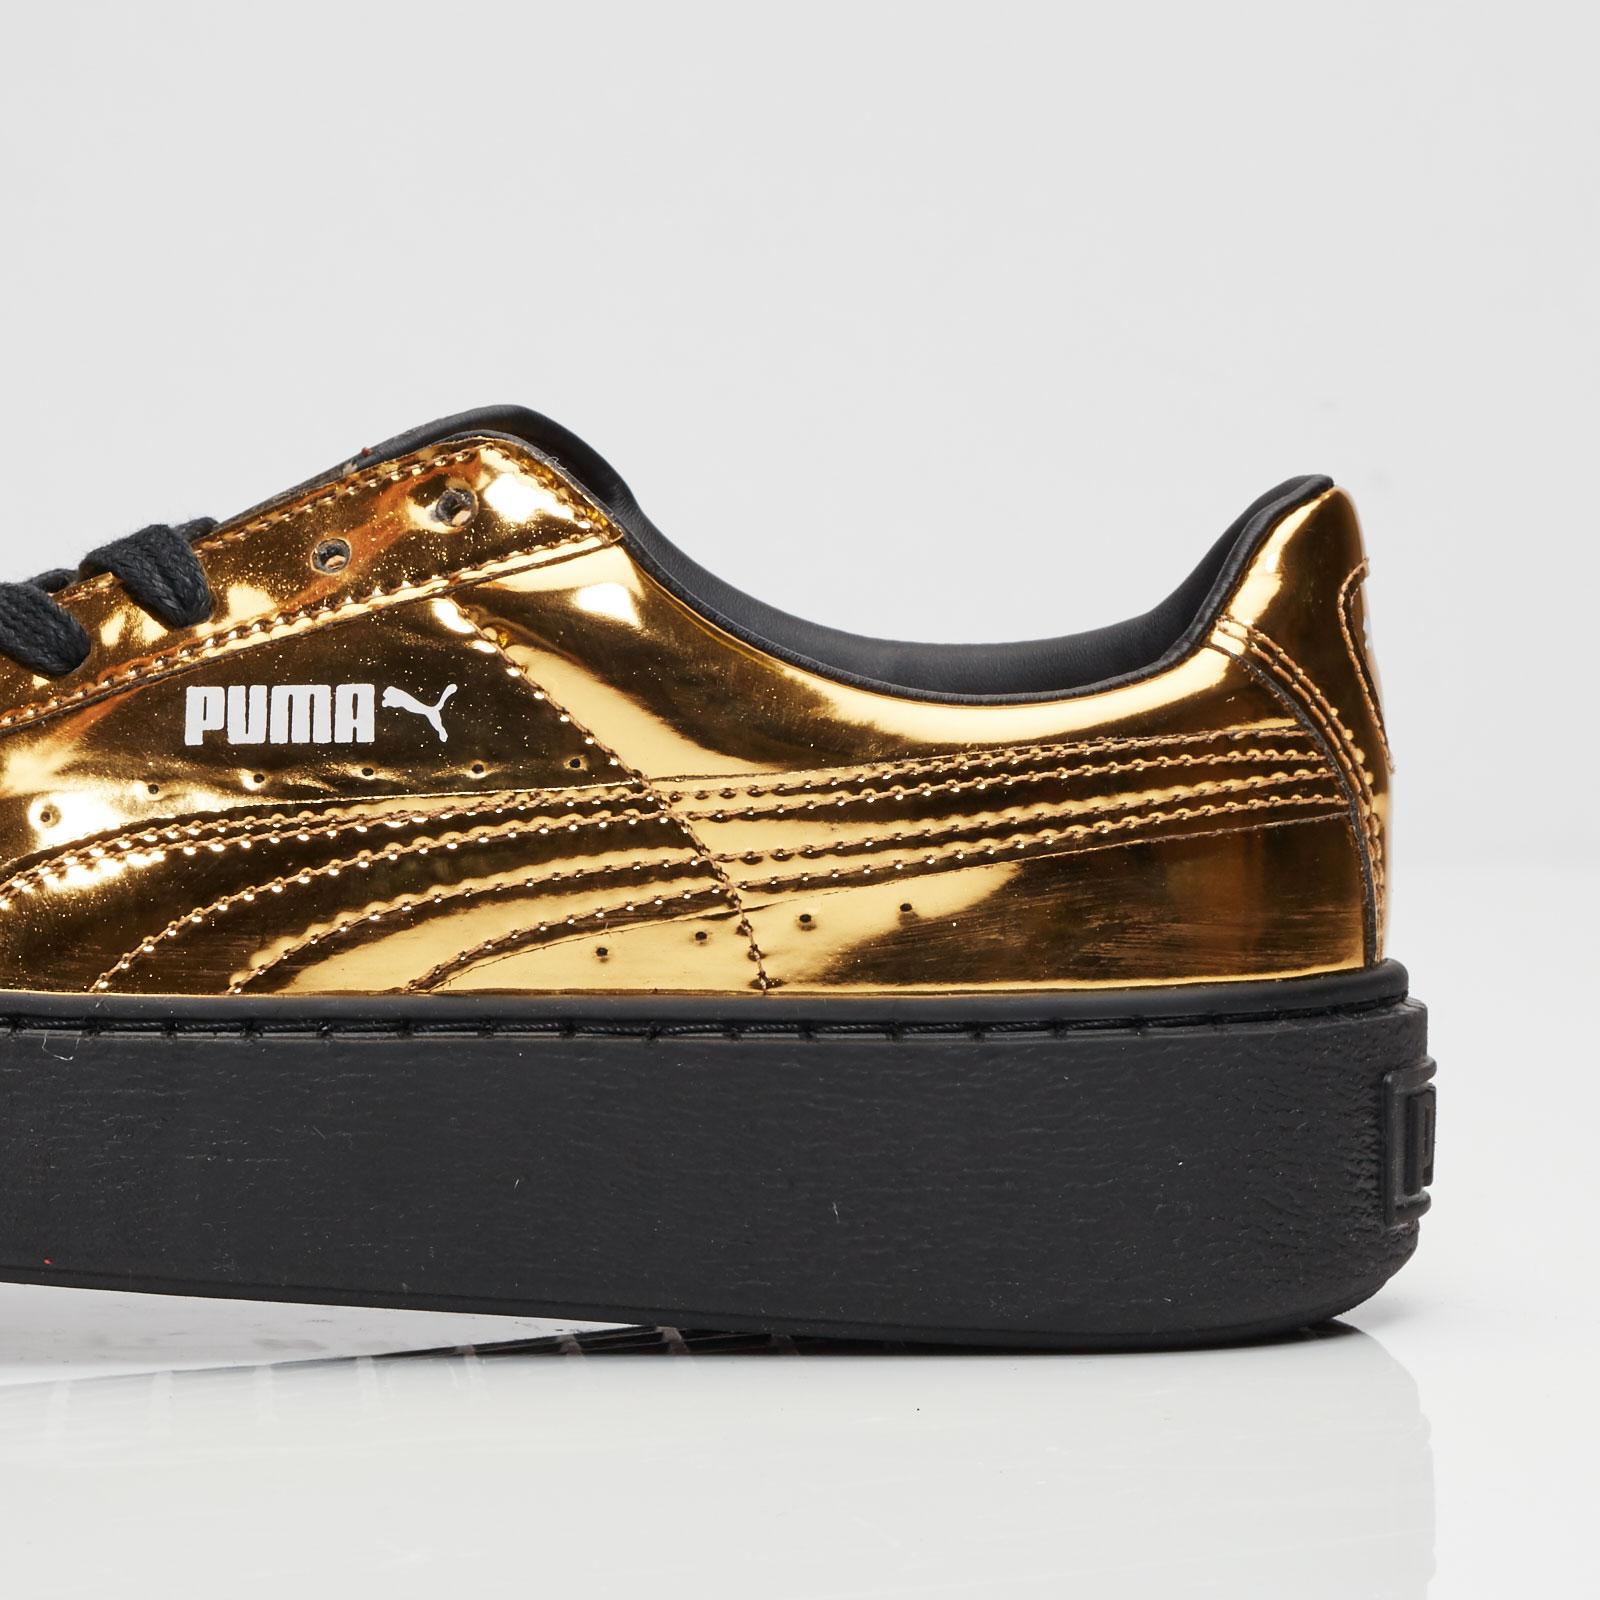 2efdbe7b5077 Puma Basket Platform Metallic - 362339-04 - Sneakersnstuff ...